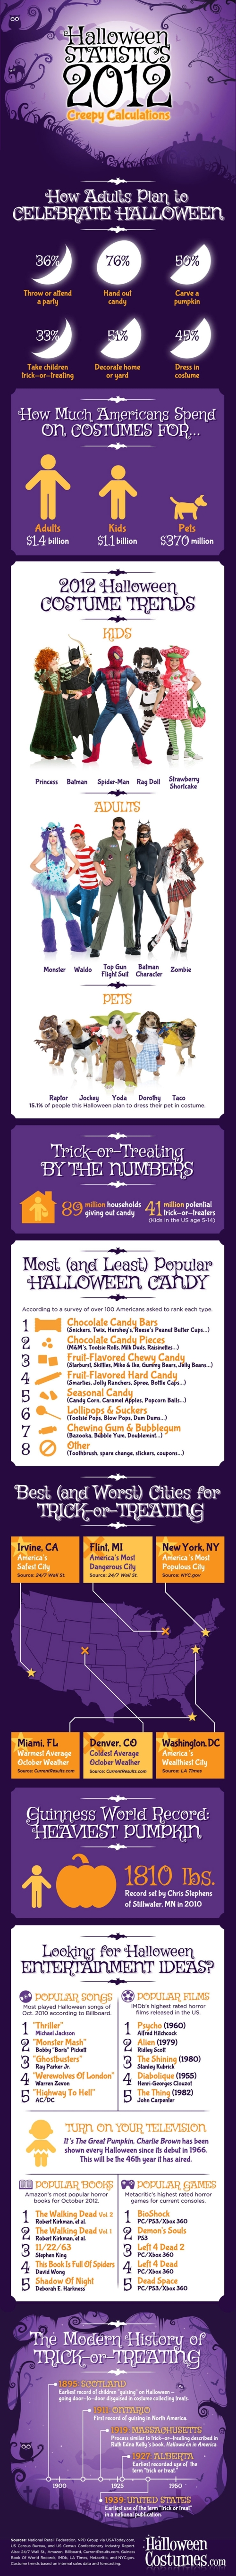 Halloween Statistics 2012: Creepy Calculations infographic